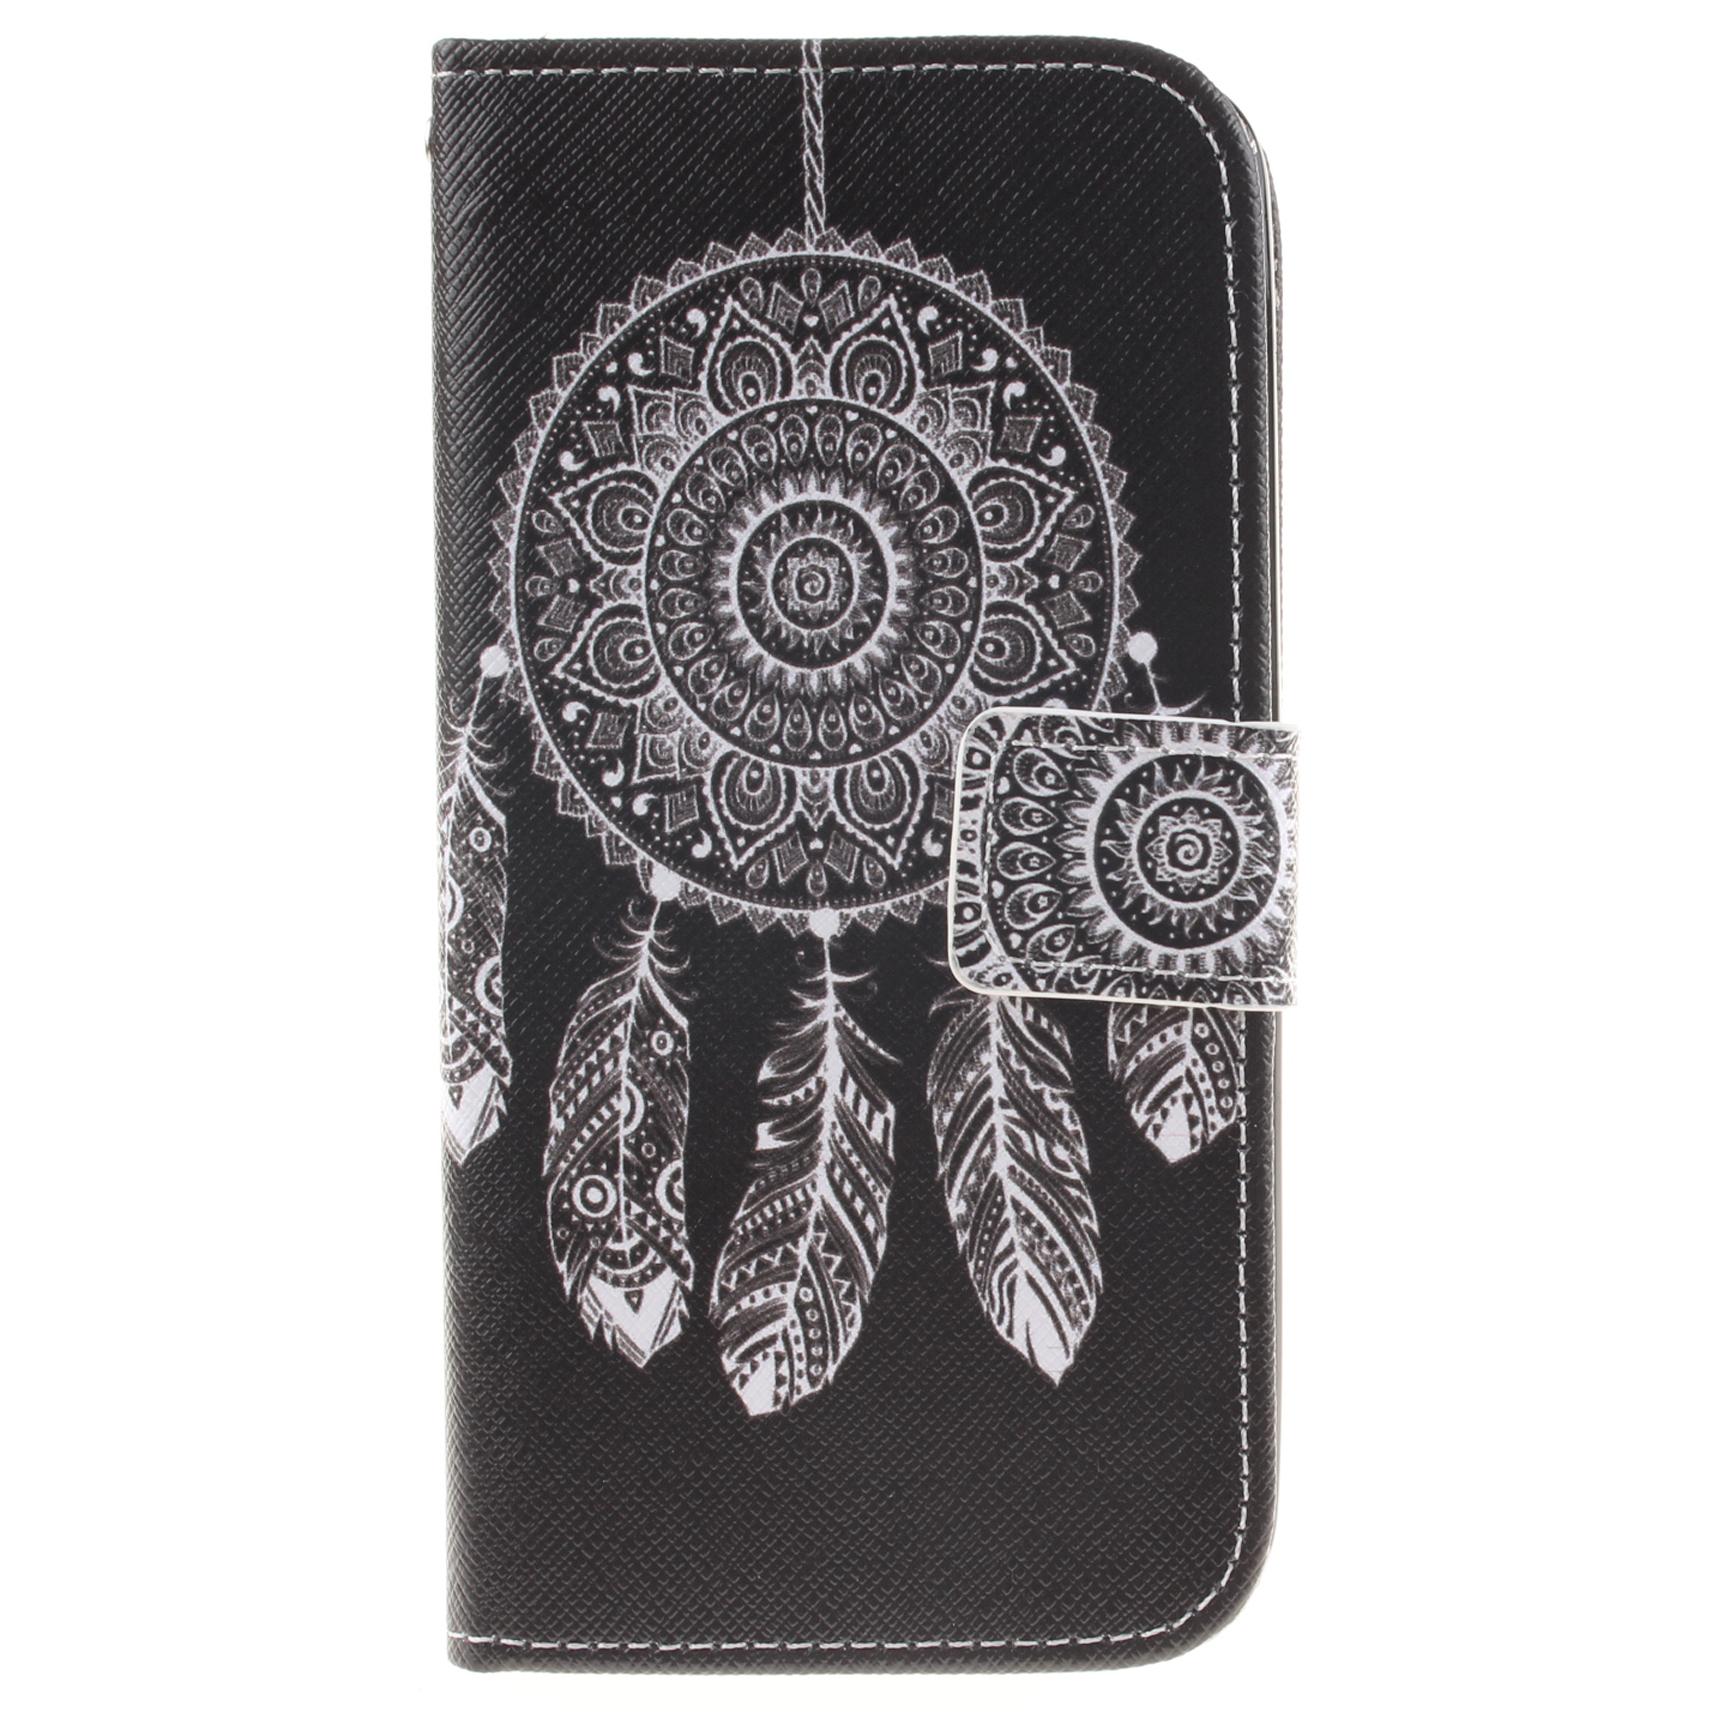 LG K10 Case Pattern Printed Flip Magnetic Wallet Card Slot Soft Protective Cover for LG K10